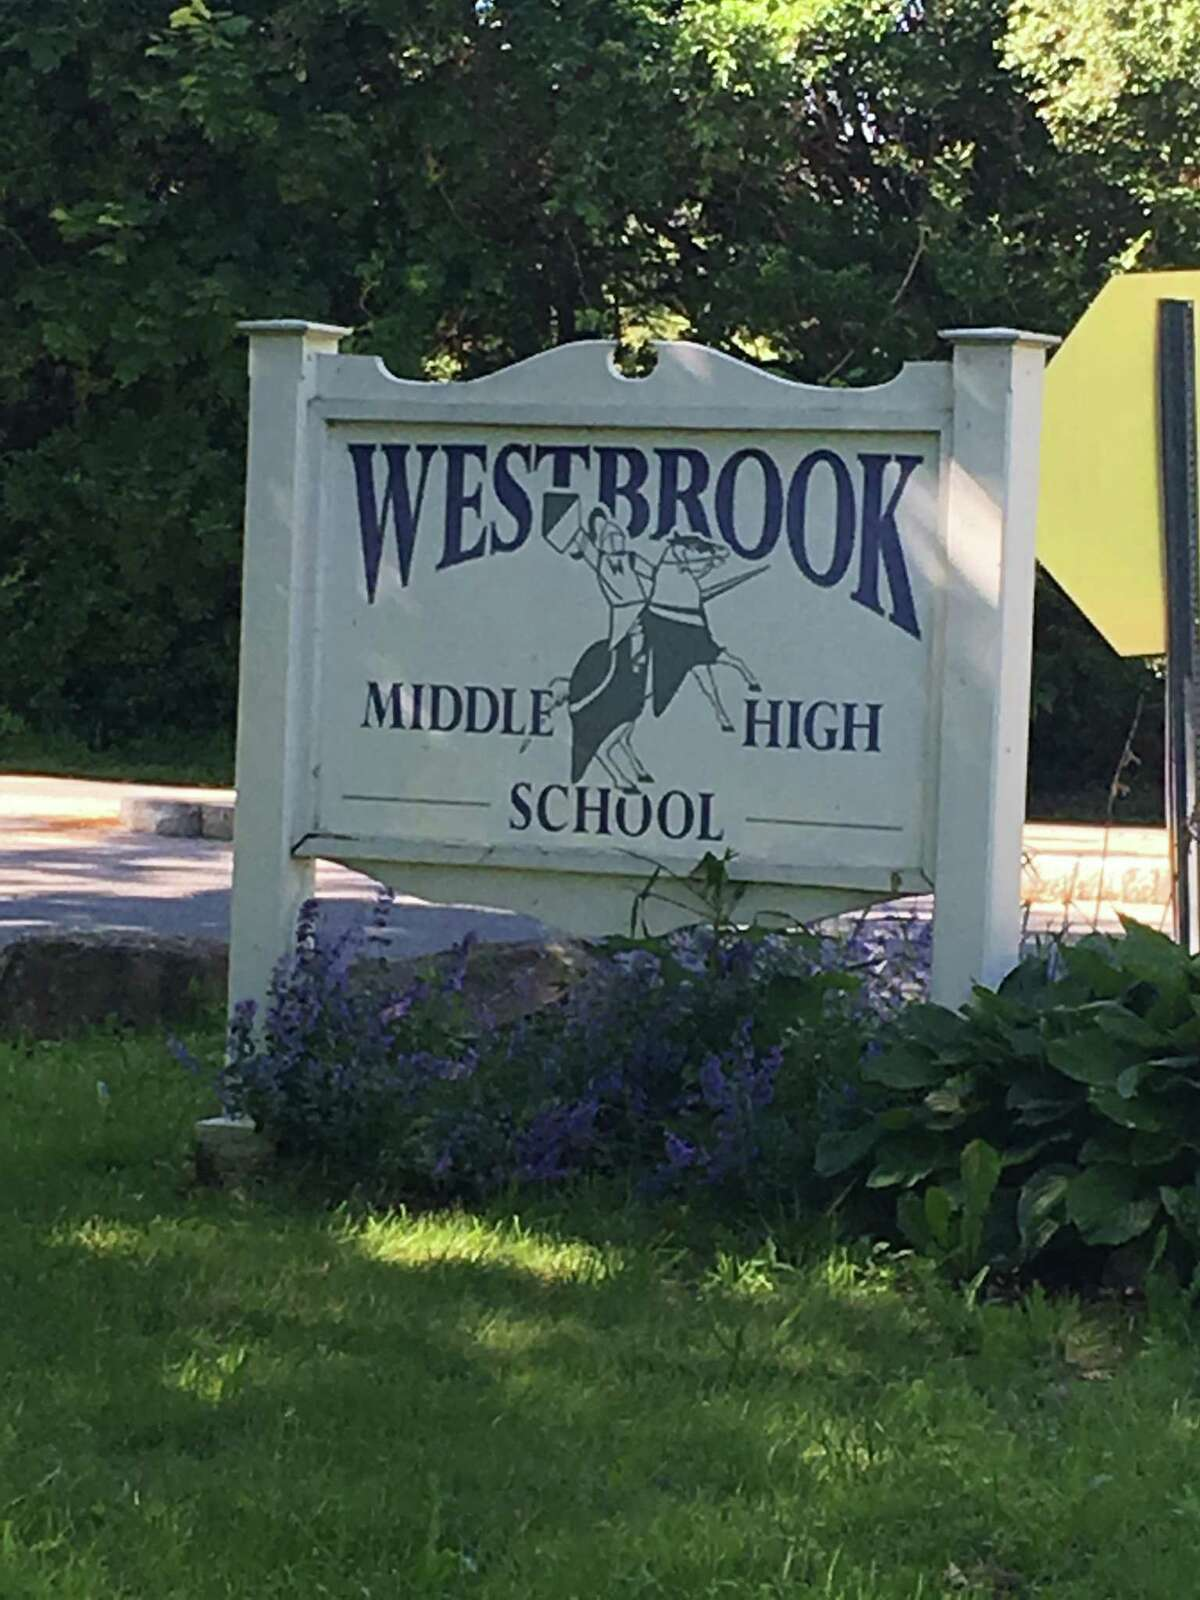 Westbrook High School